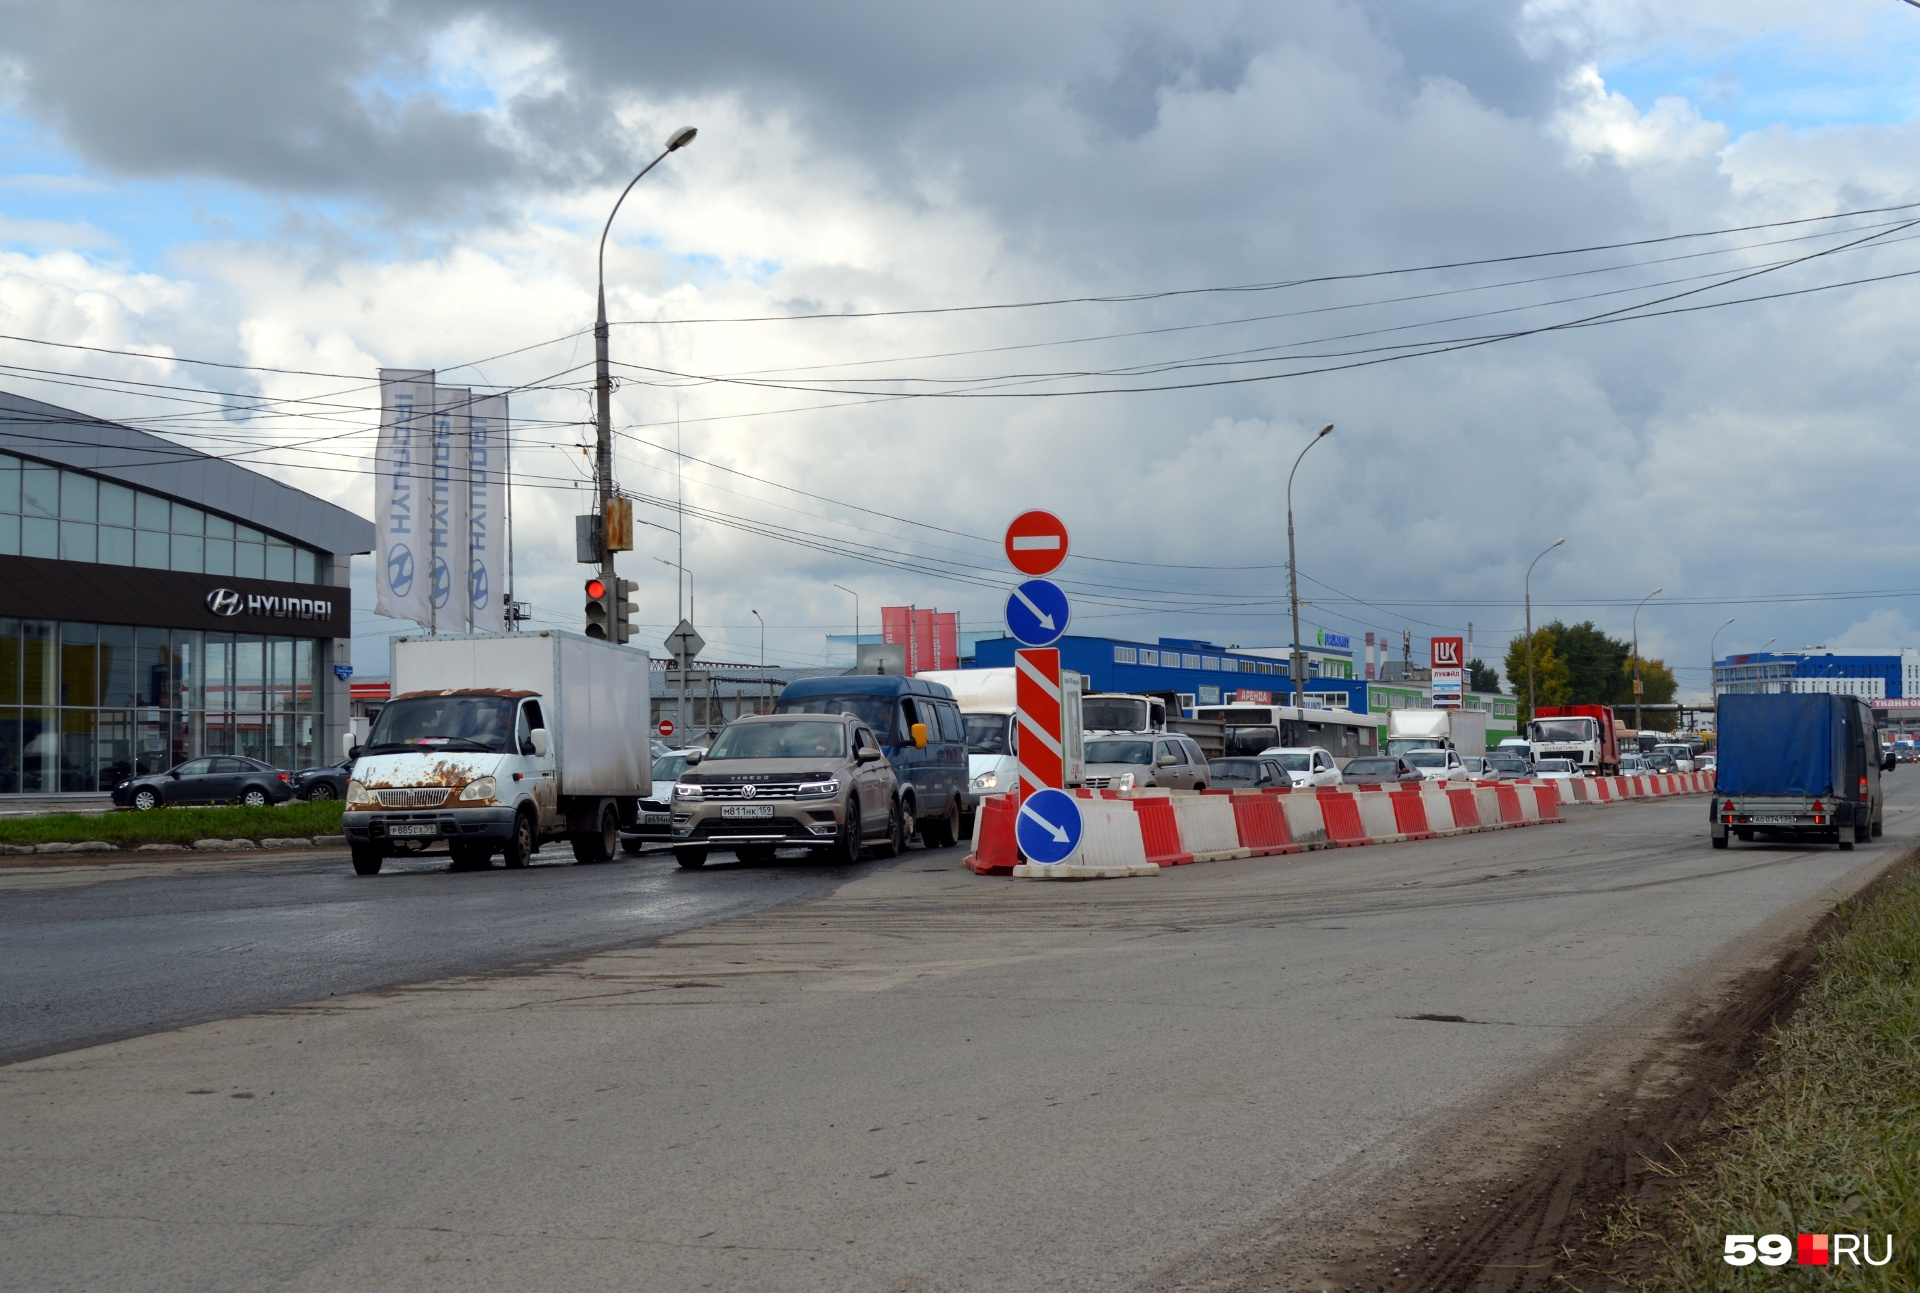 Такая ситуация у «Баумолла» — в сторону центра пустая дорога, а навстречу длиннющая пробка